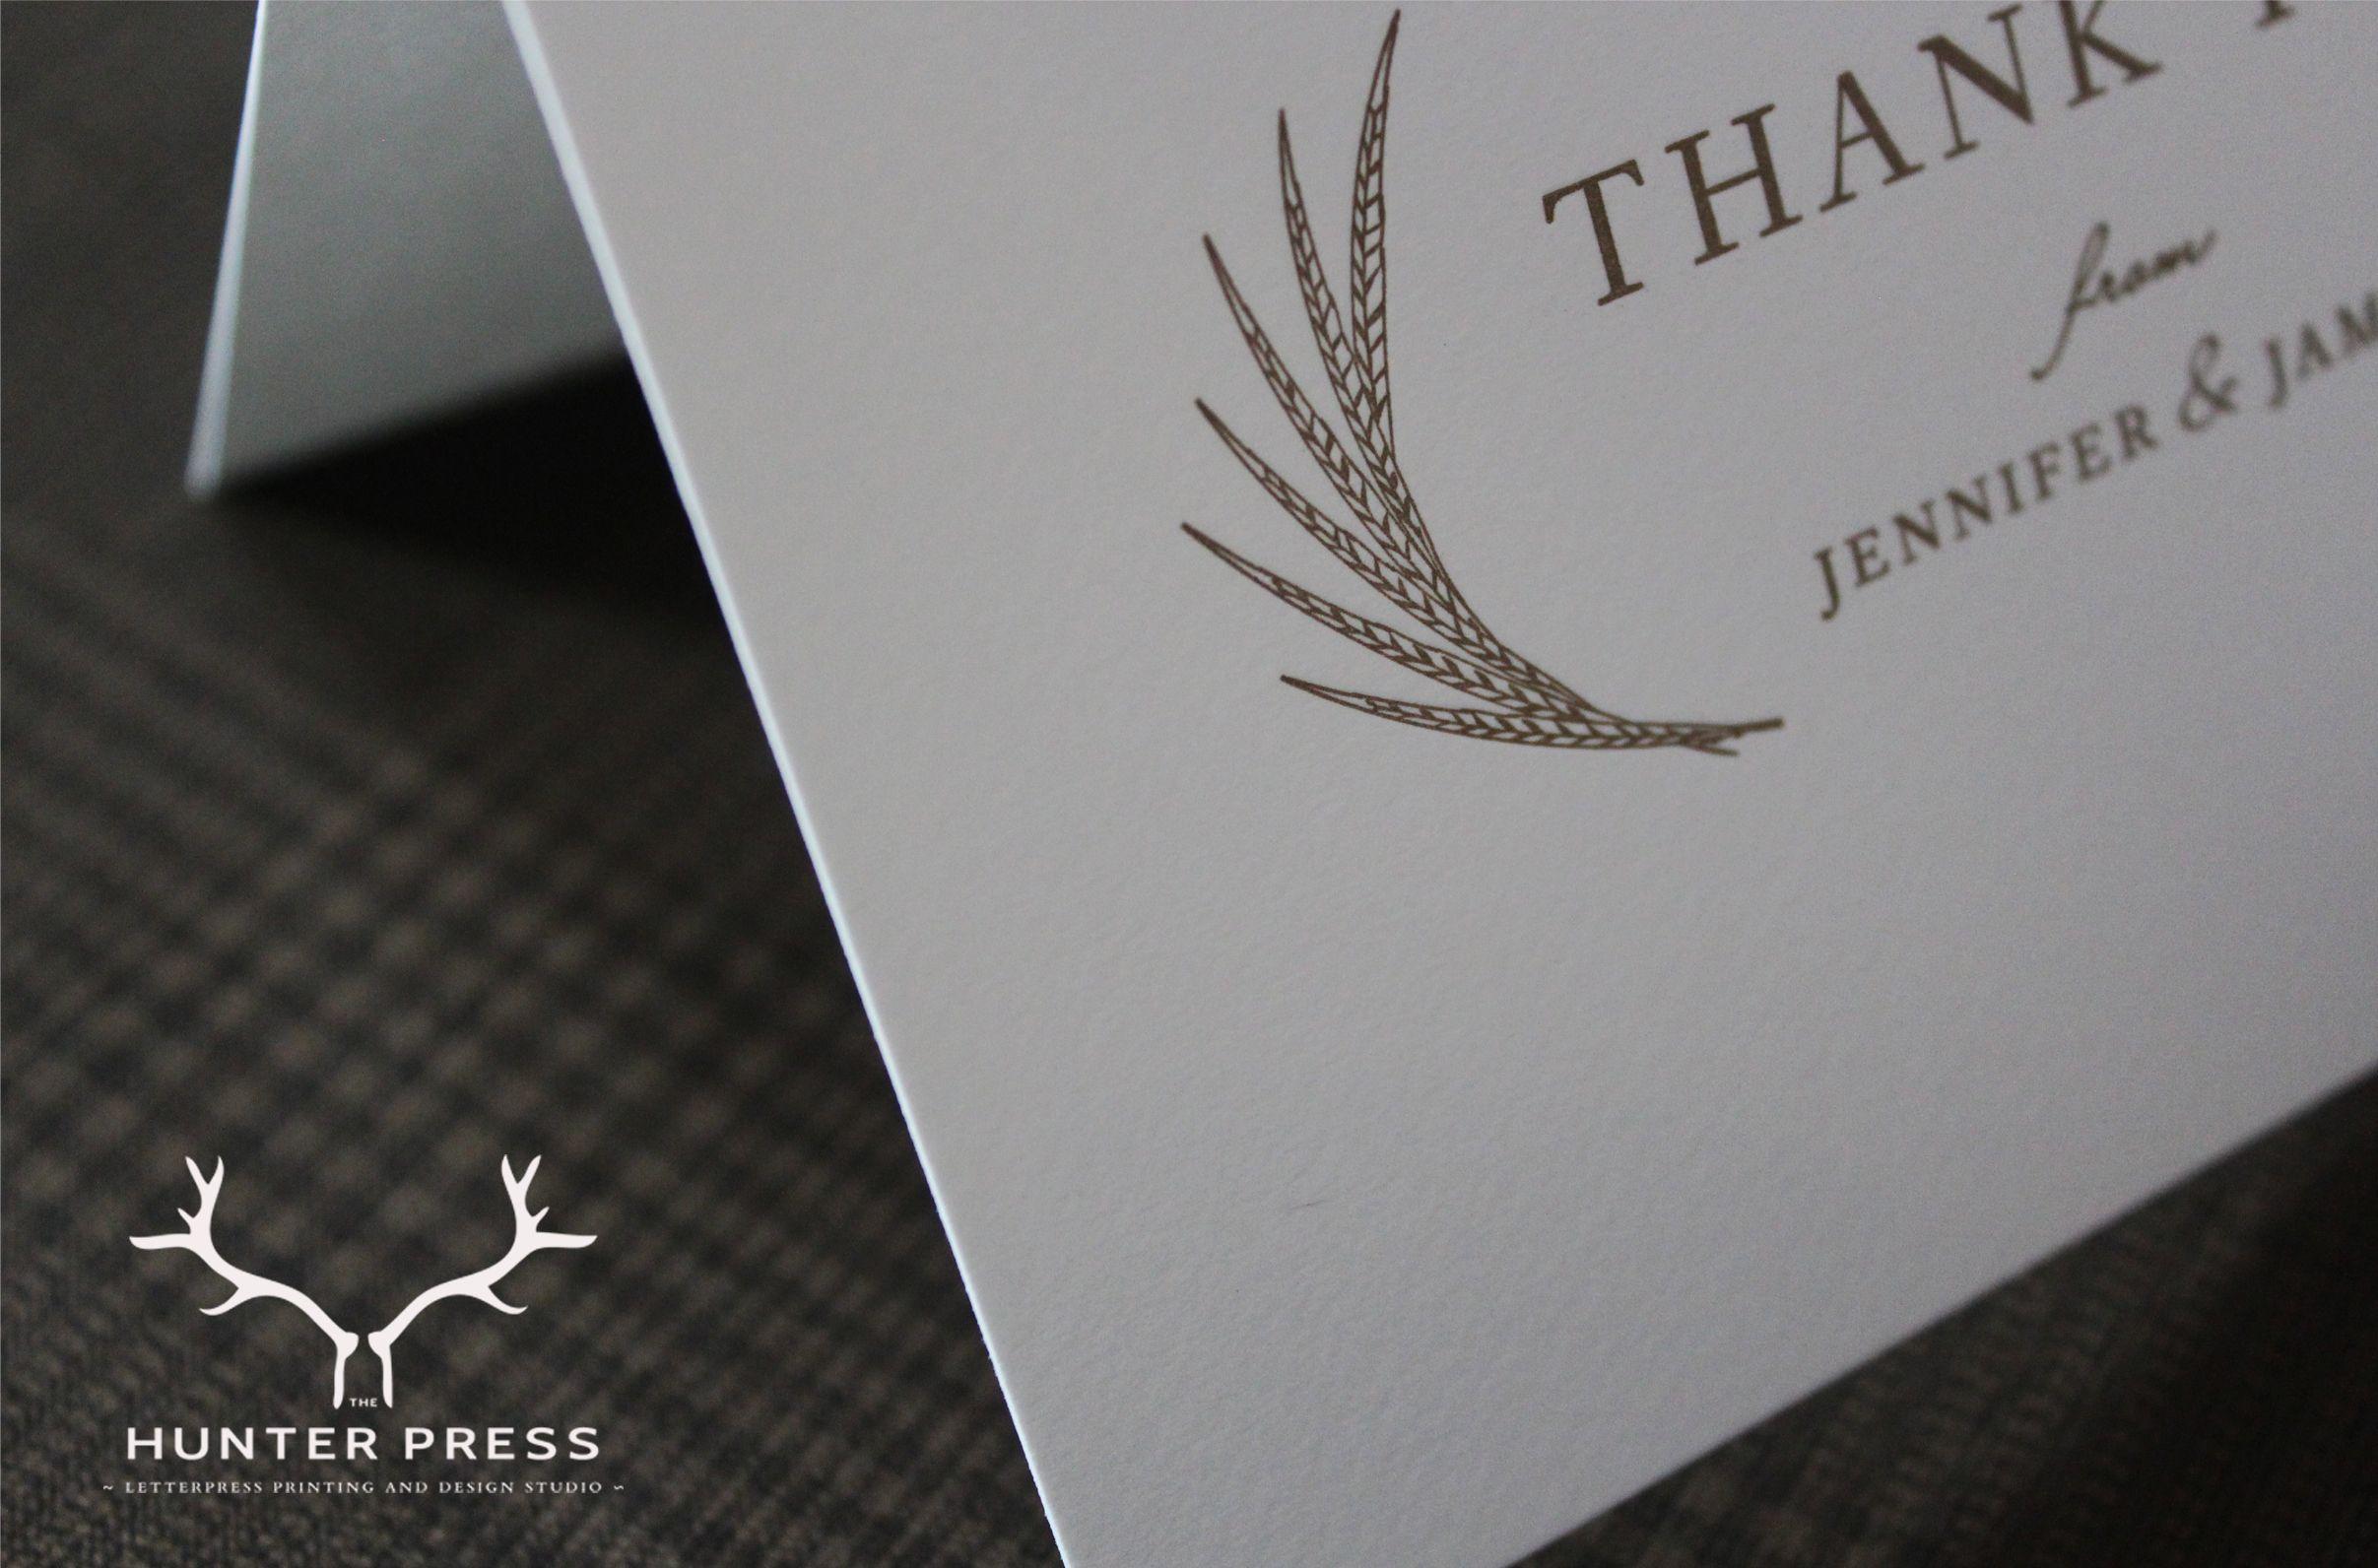 Bespoke Wedding Thank You Cards. The Hunter Press. #letterpress #stationery #thankyou #wedding #scottishinvitations